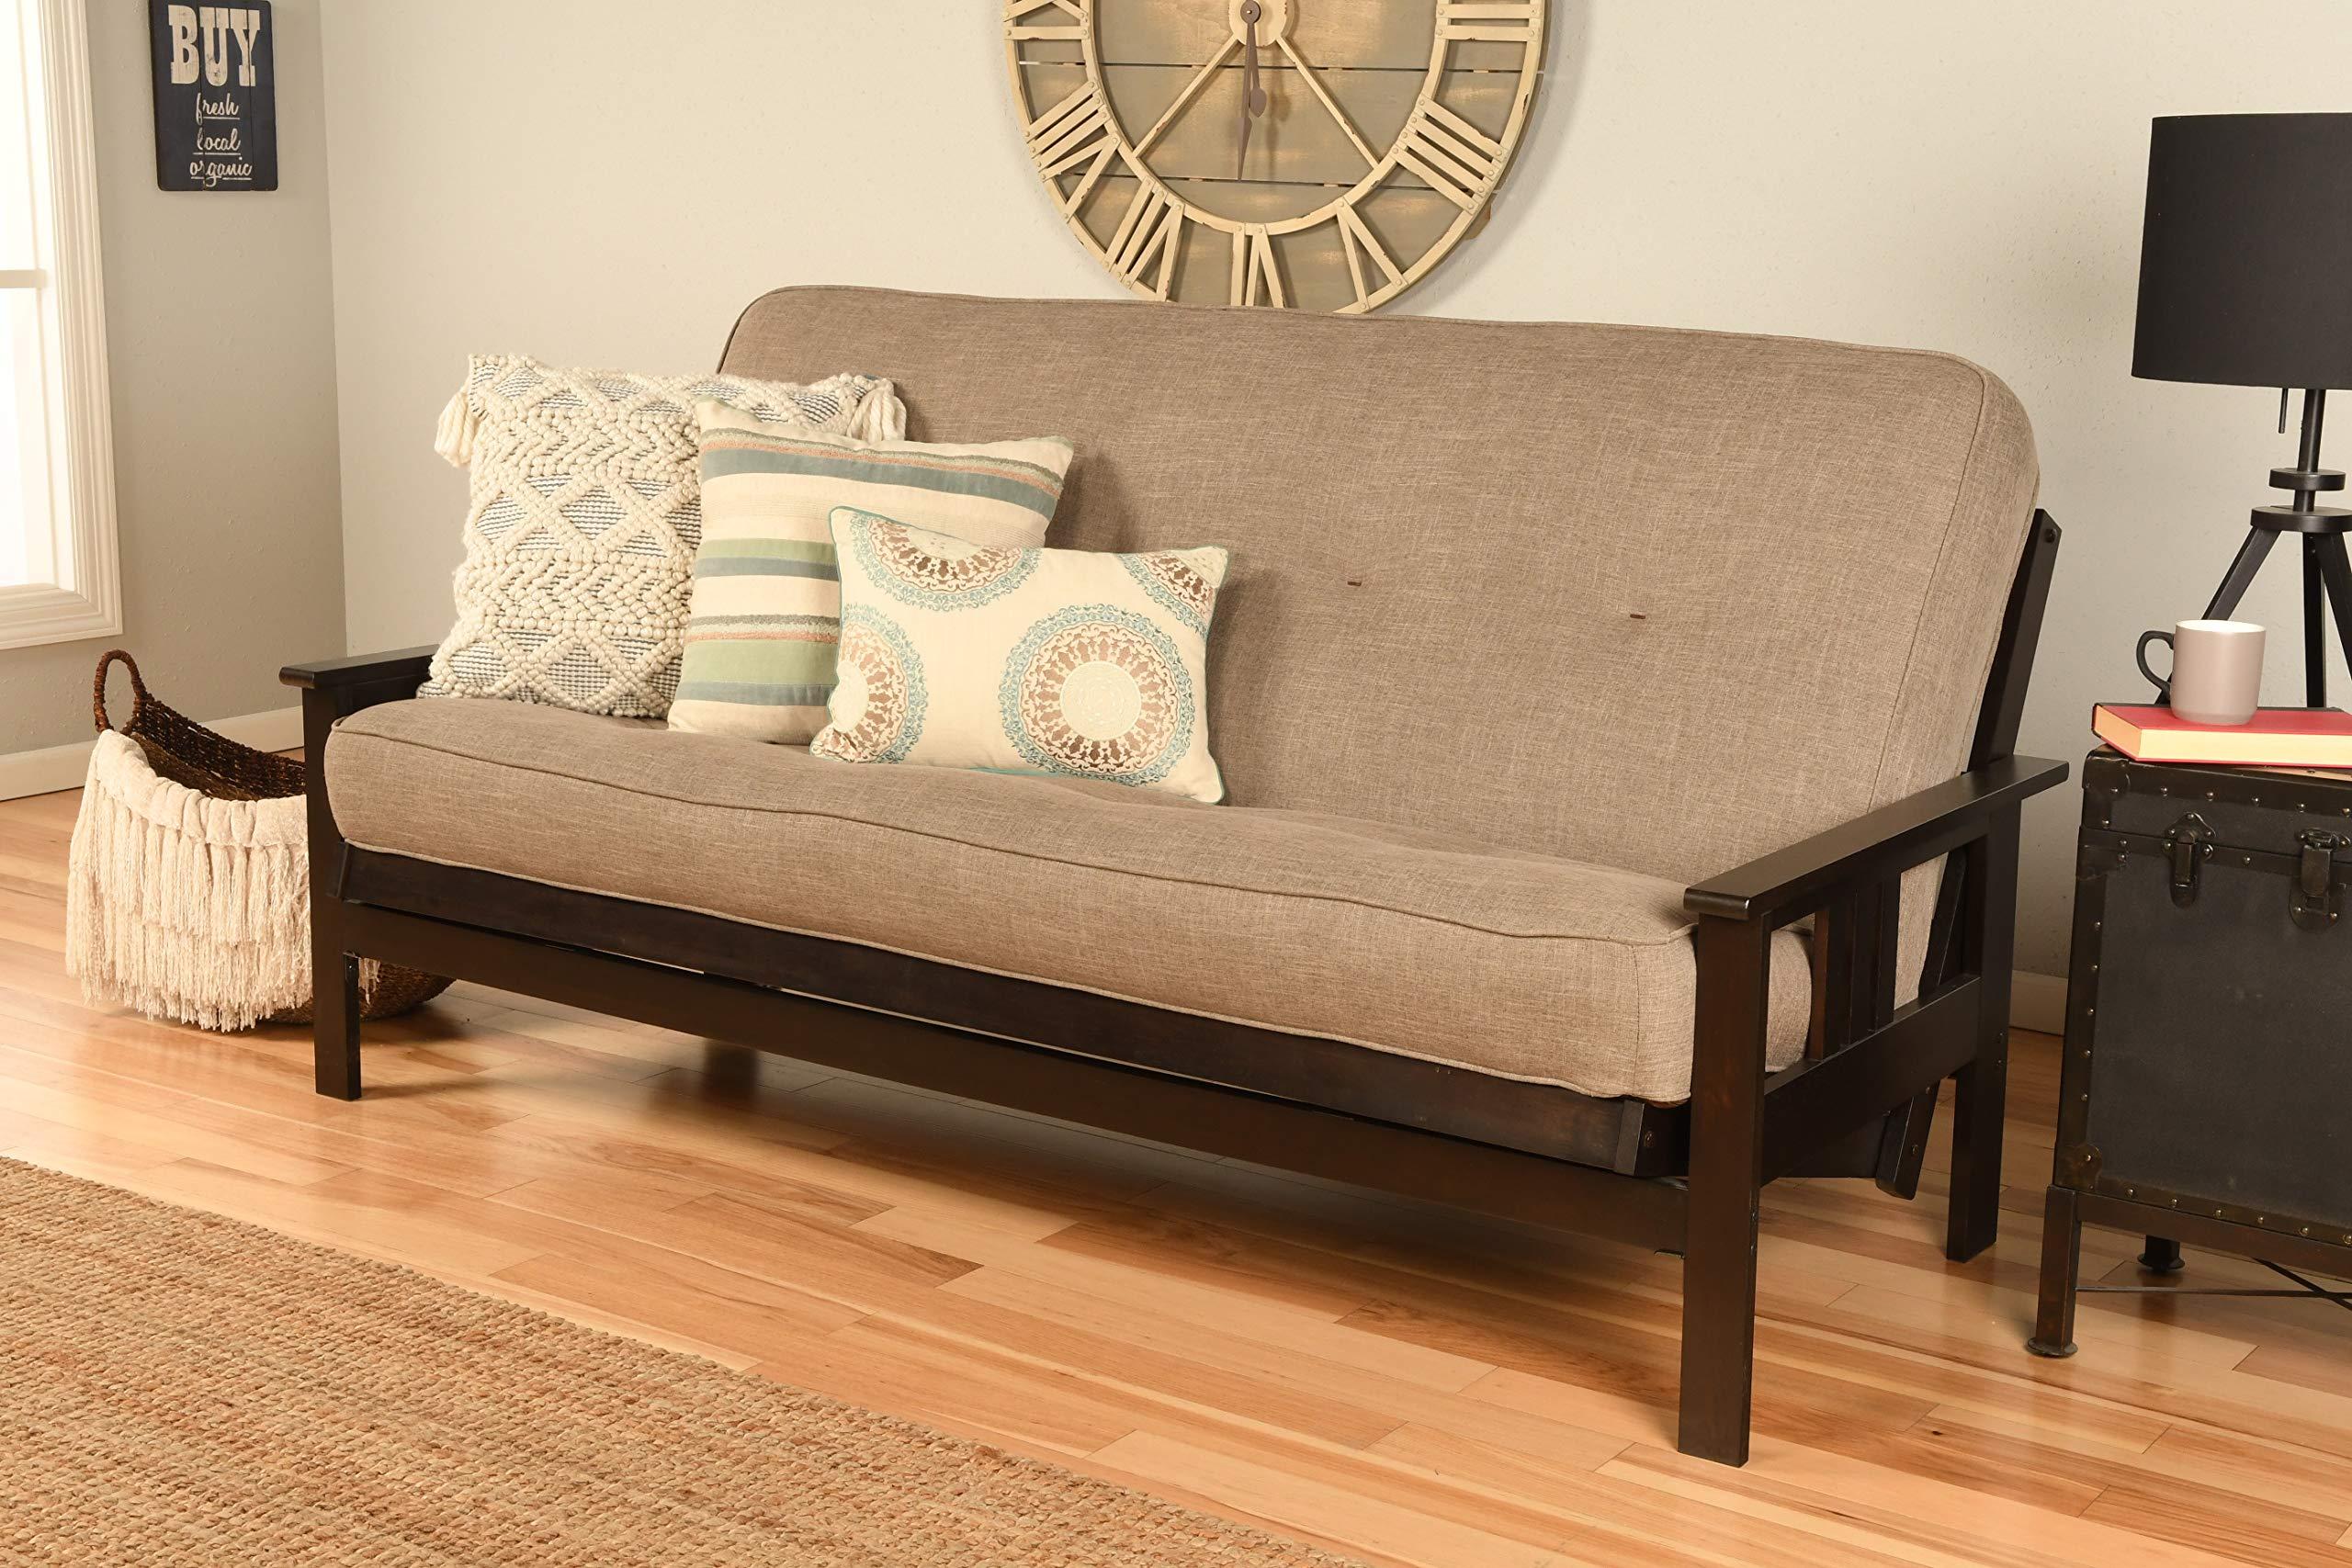 Kodiak Furniture KFMOEPLSTNLF5MD3 Monterey Futon Set with Espresso Finish, Full, Linen Stone by Kodiak Furniture